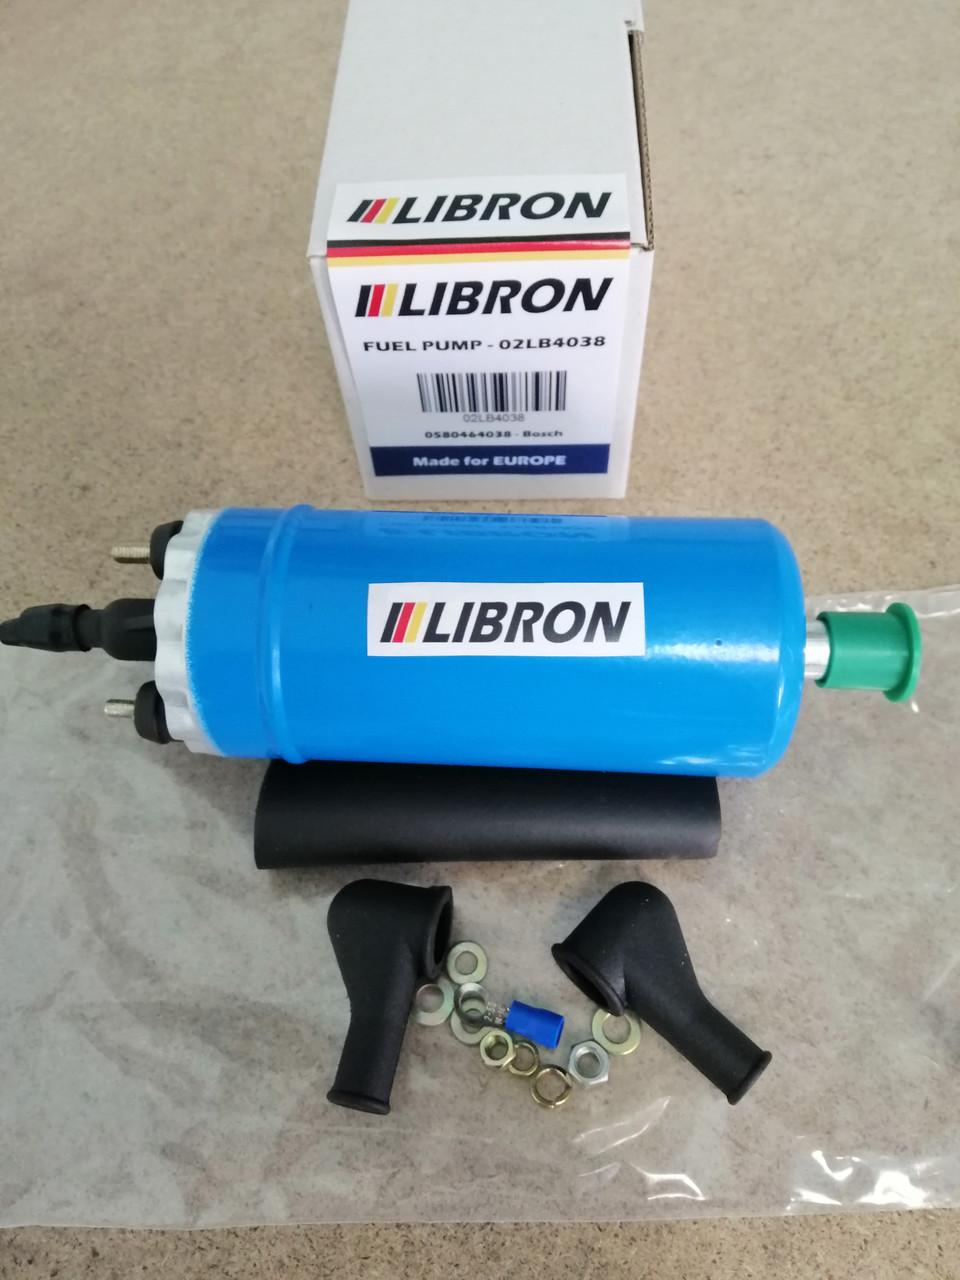 Бензонасос LIBRON 02LB4038 - Опель Омега A (16_, 17_, 19_) 2.0 (1986-1994)